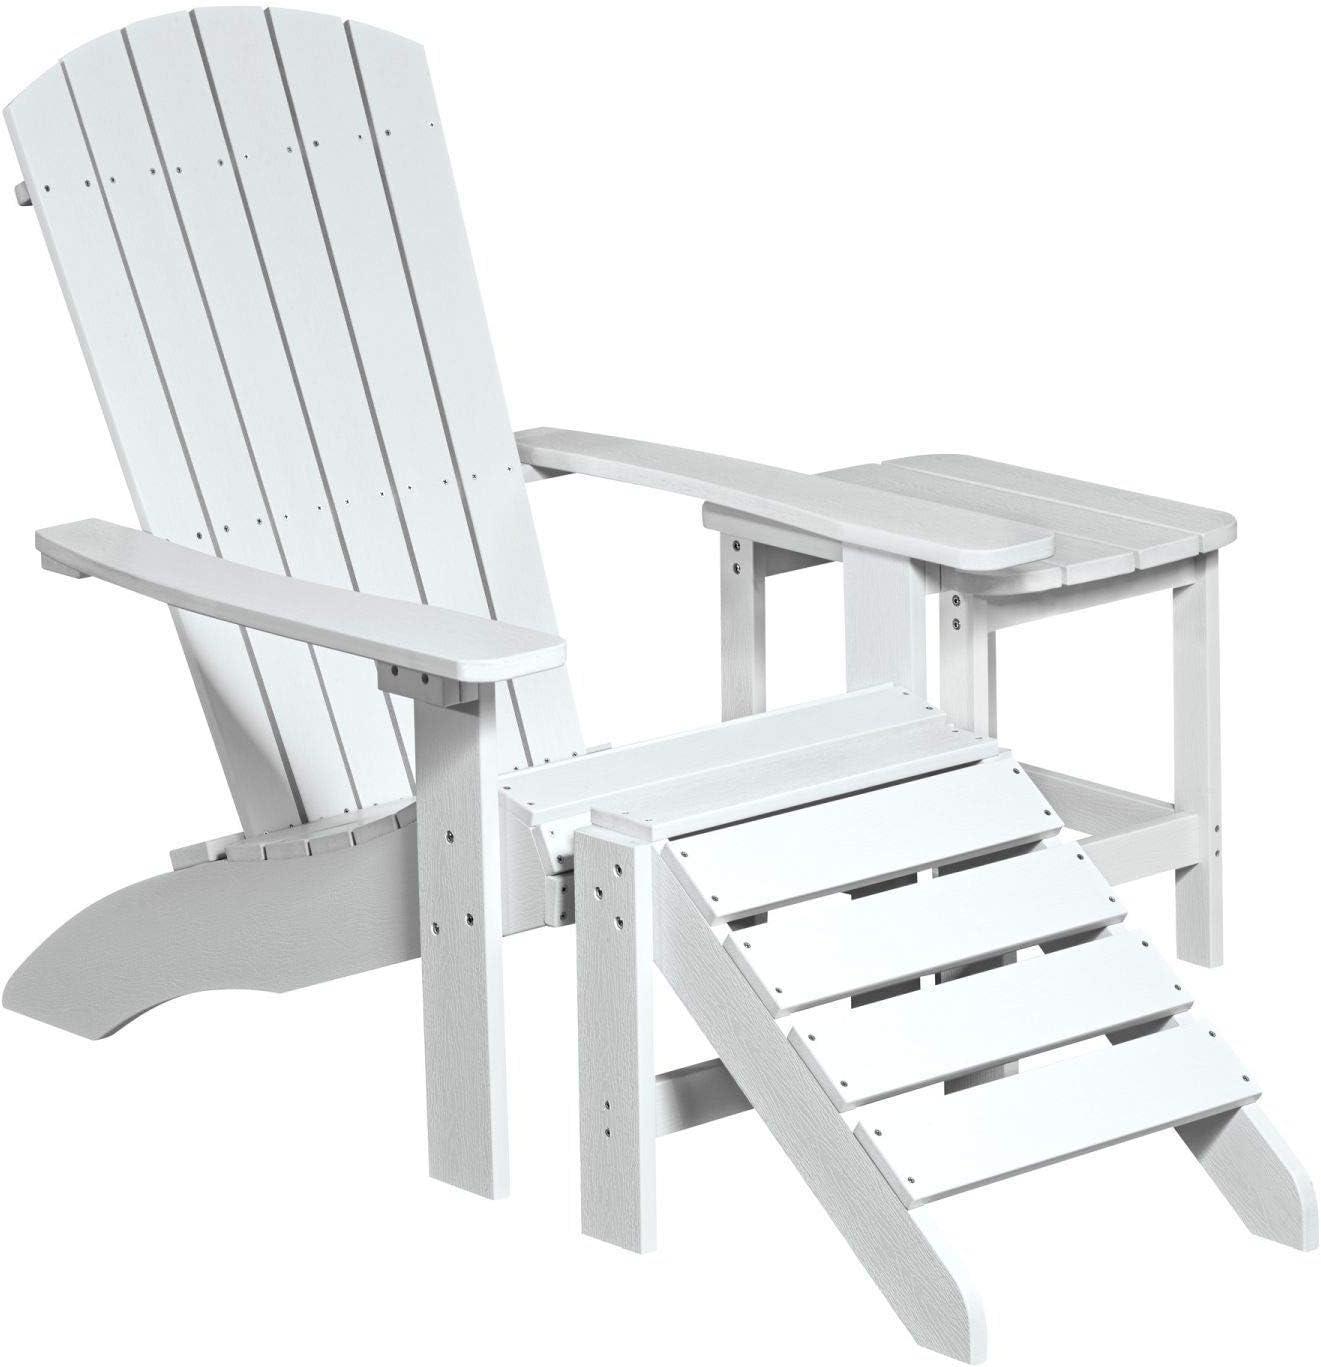 NEG Design Adirondack Stuhl Marcy Westport-Chair//Sessel aus Polywood-Kunststoff orange Holzoptik, wetterfest, UV- und farbbest/ändig